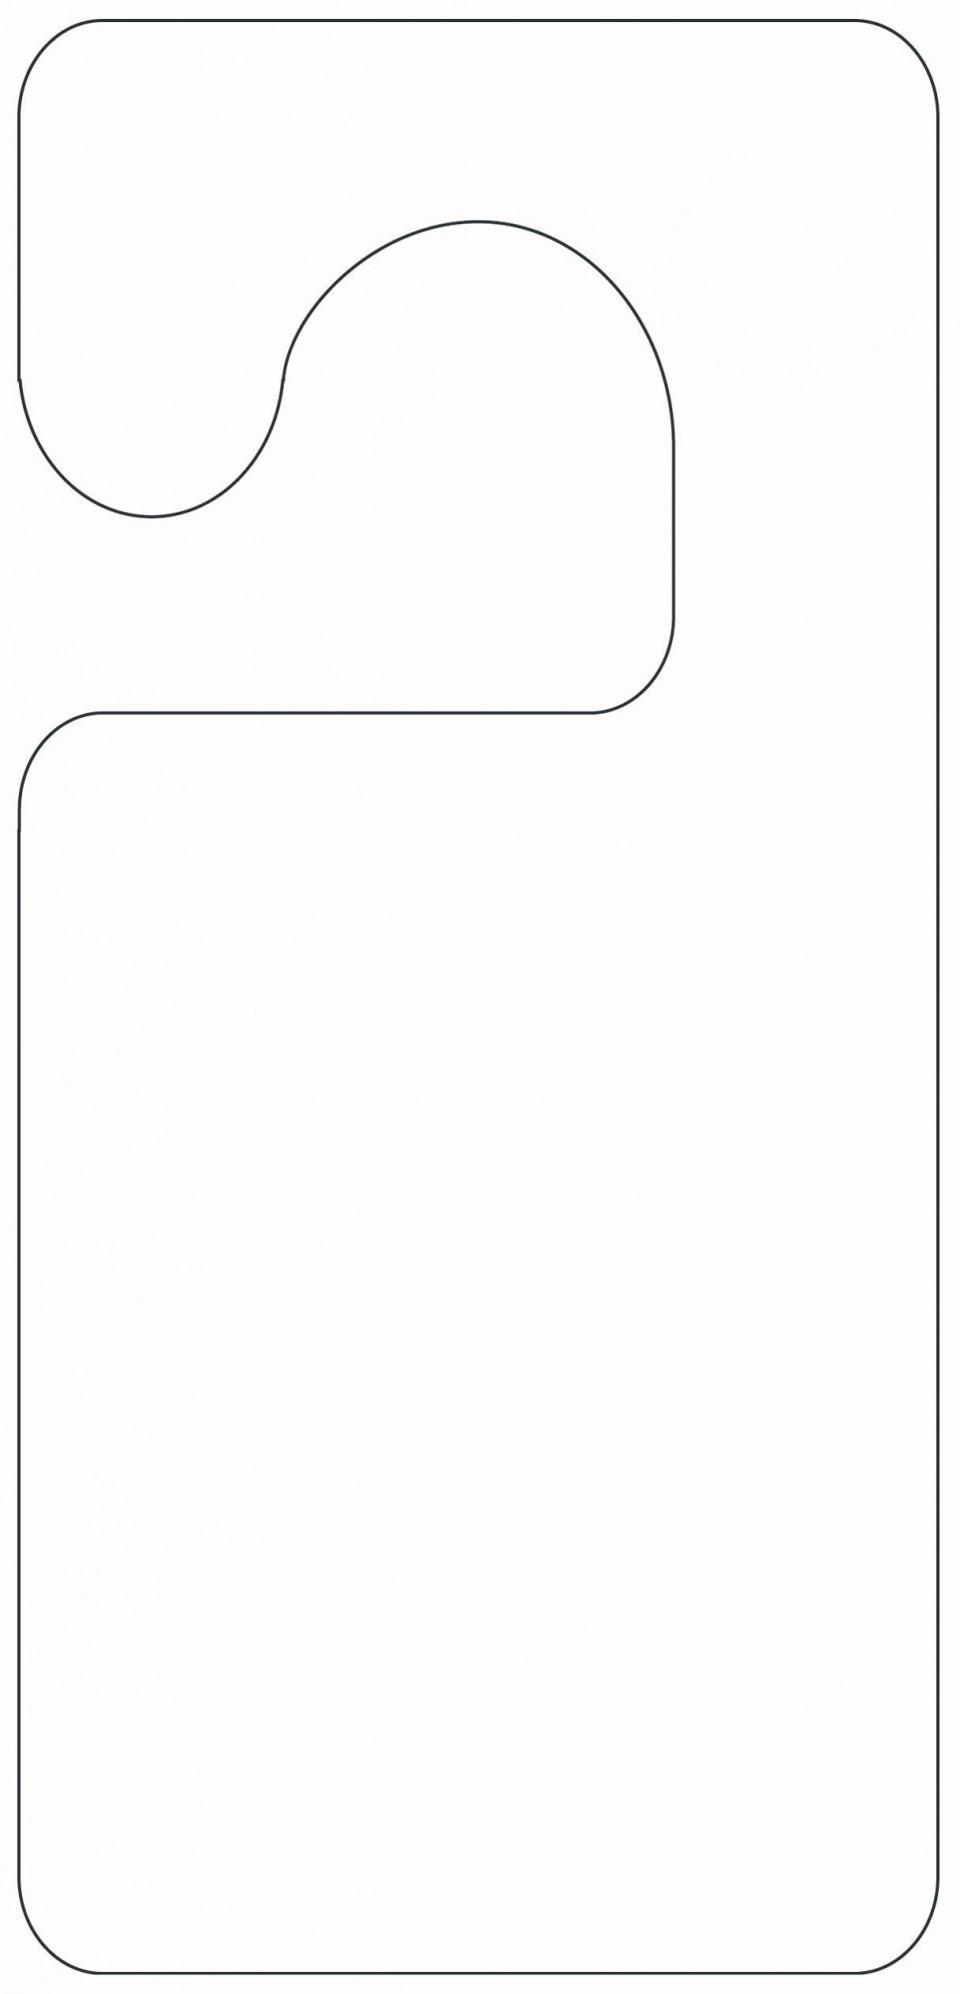 002 Wondrou Free Printable Template For Door Hanger Sample 960